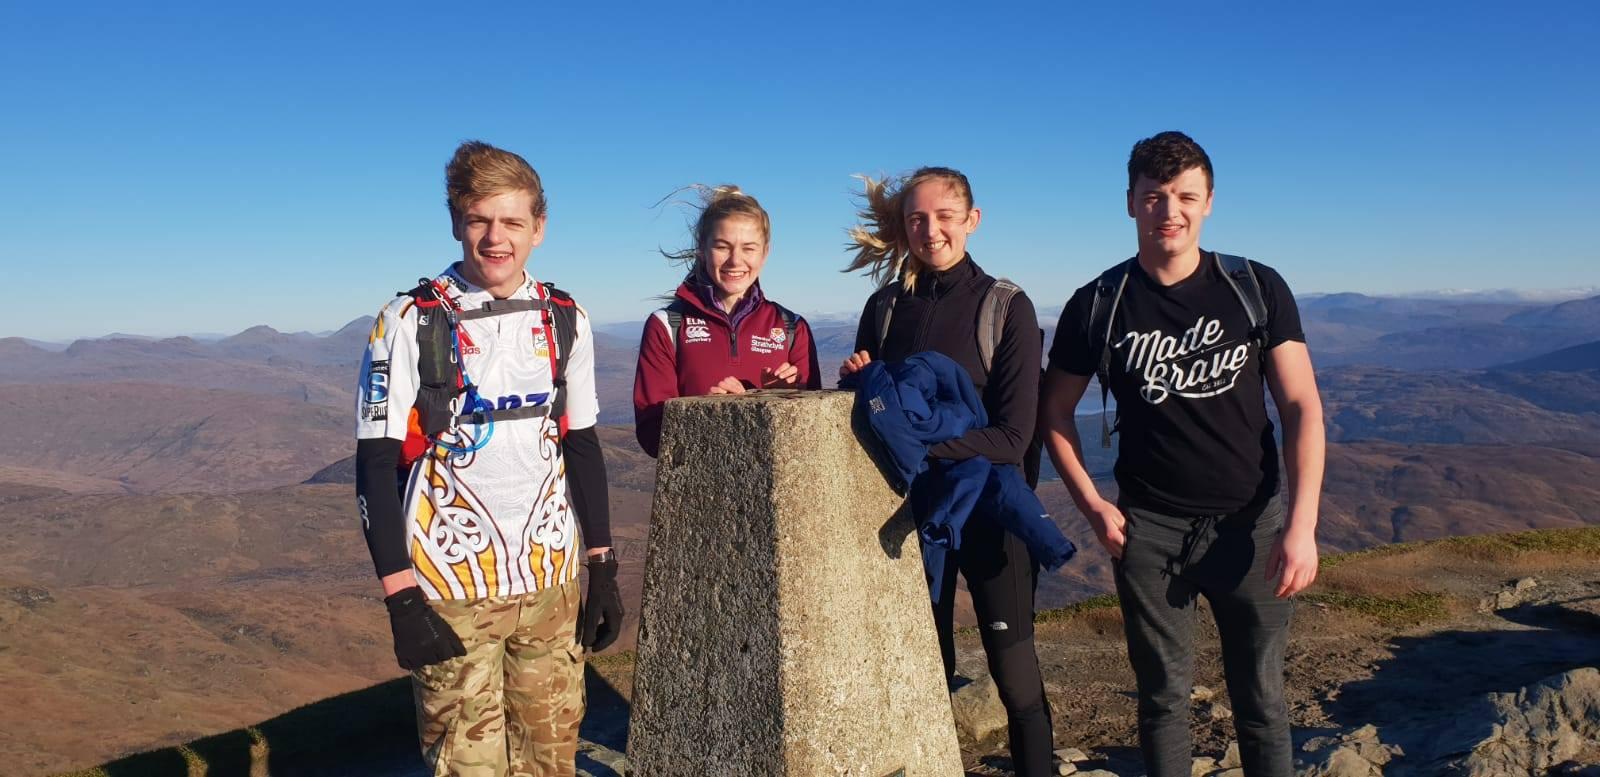 Left to right: Jamie McLaren, Emily McNicol, Miri Gunther, Ross Hutcheson train on Ben Lomond.